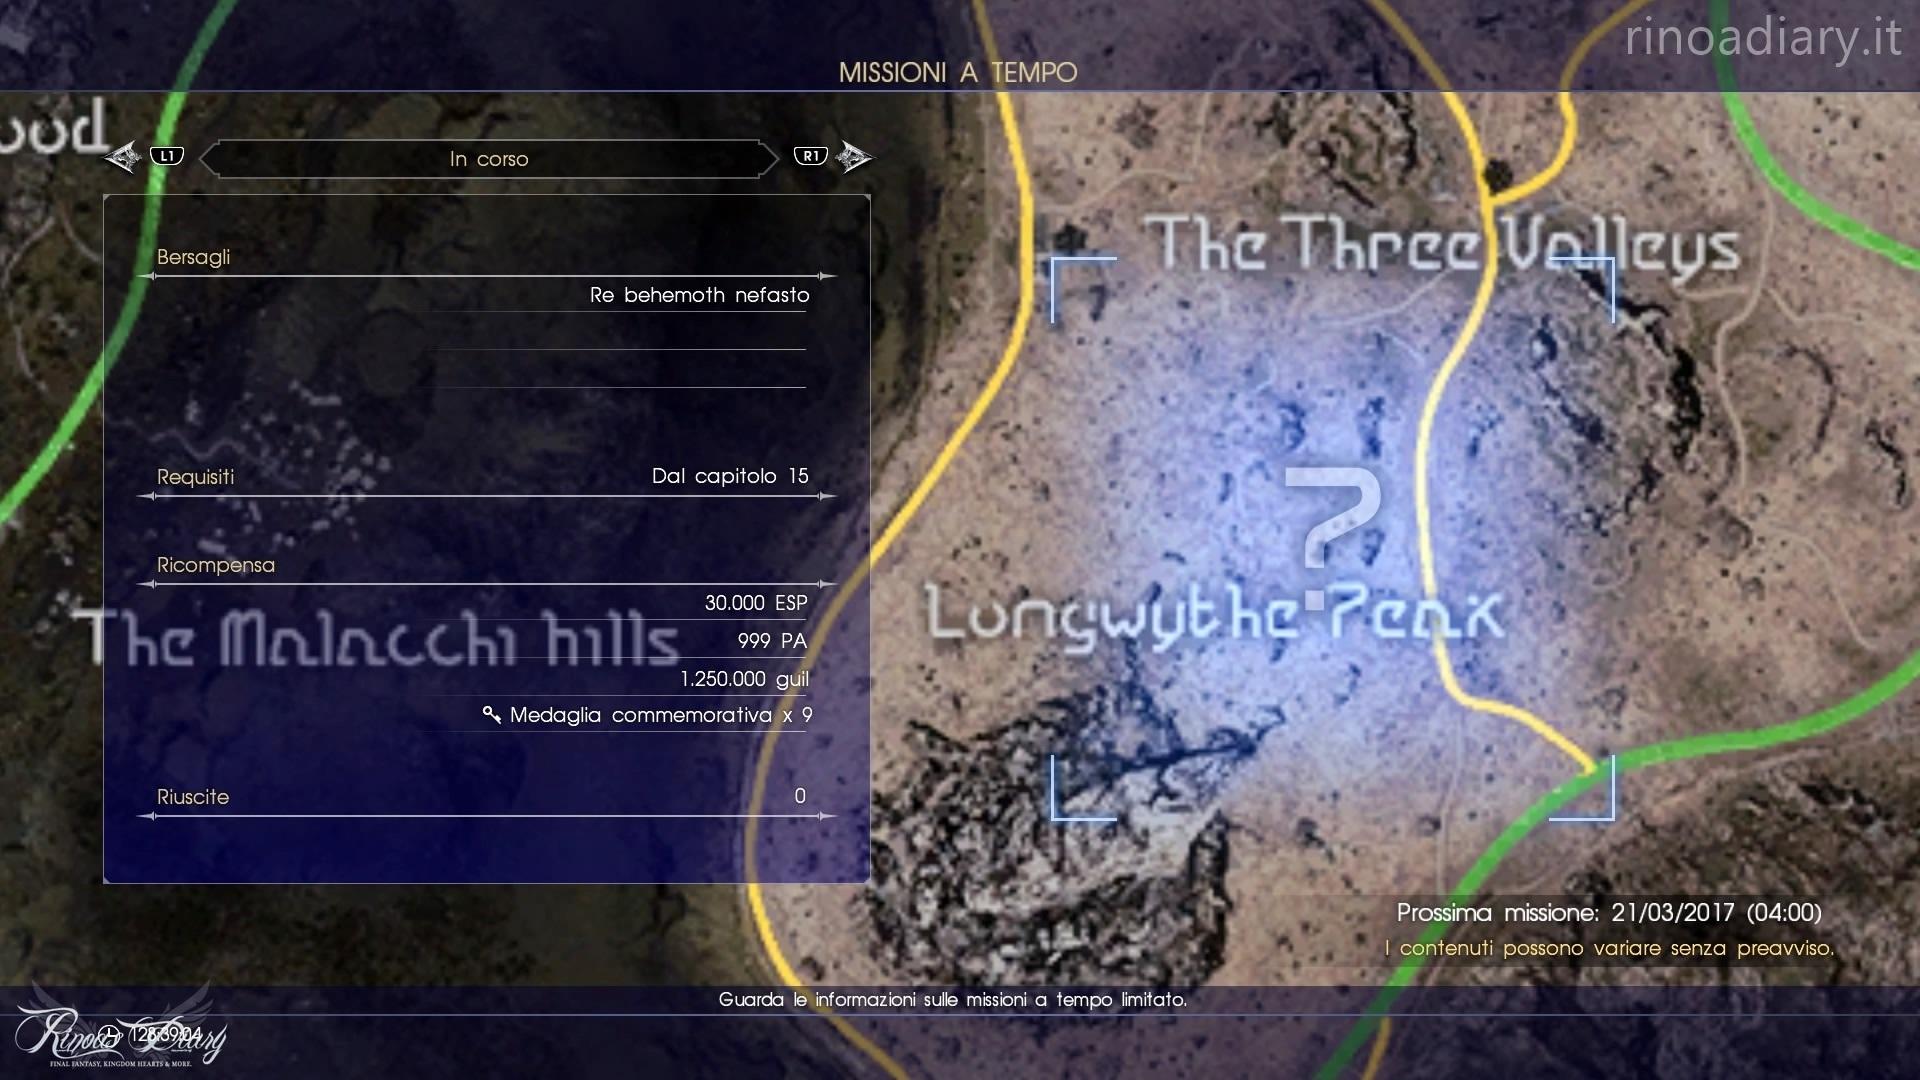 Final Fantasy XV - Missioni a tempo - Re Behemoth Nefasto #1